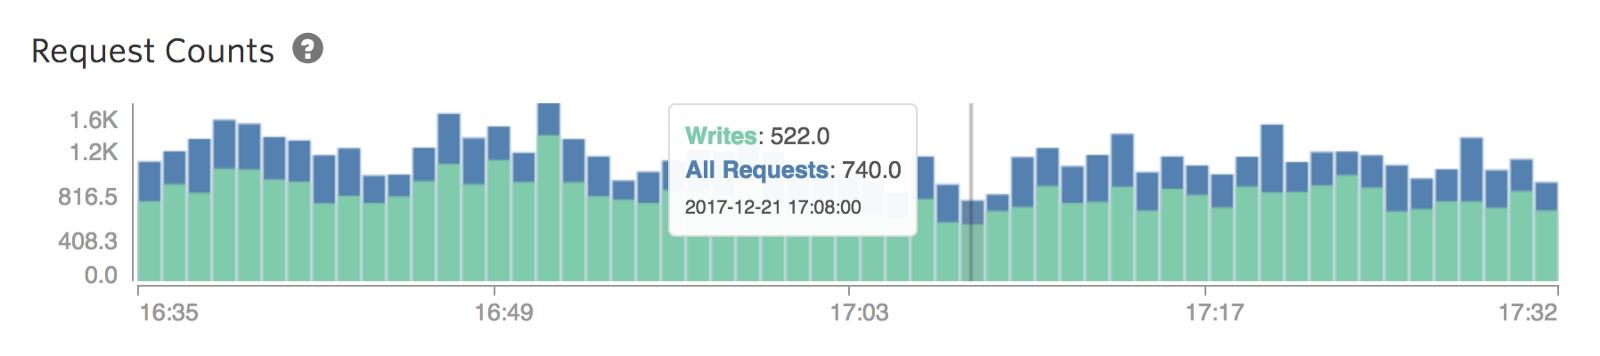 Request counts with a zero minimum.